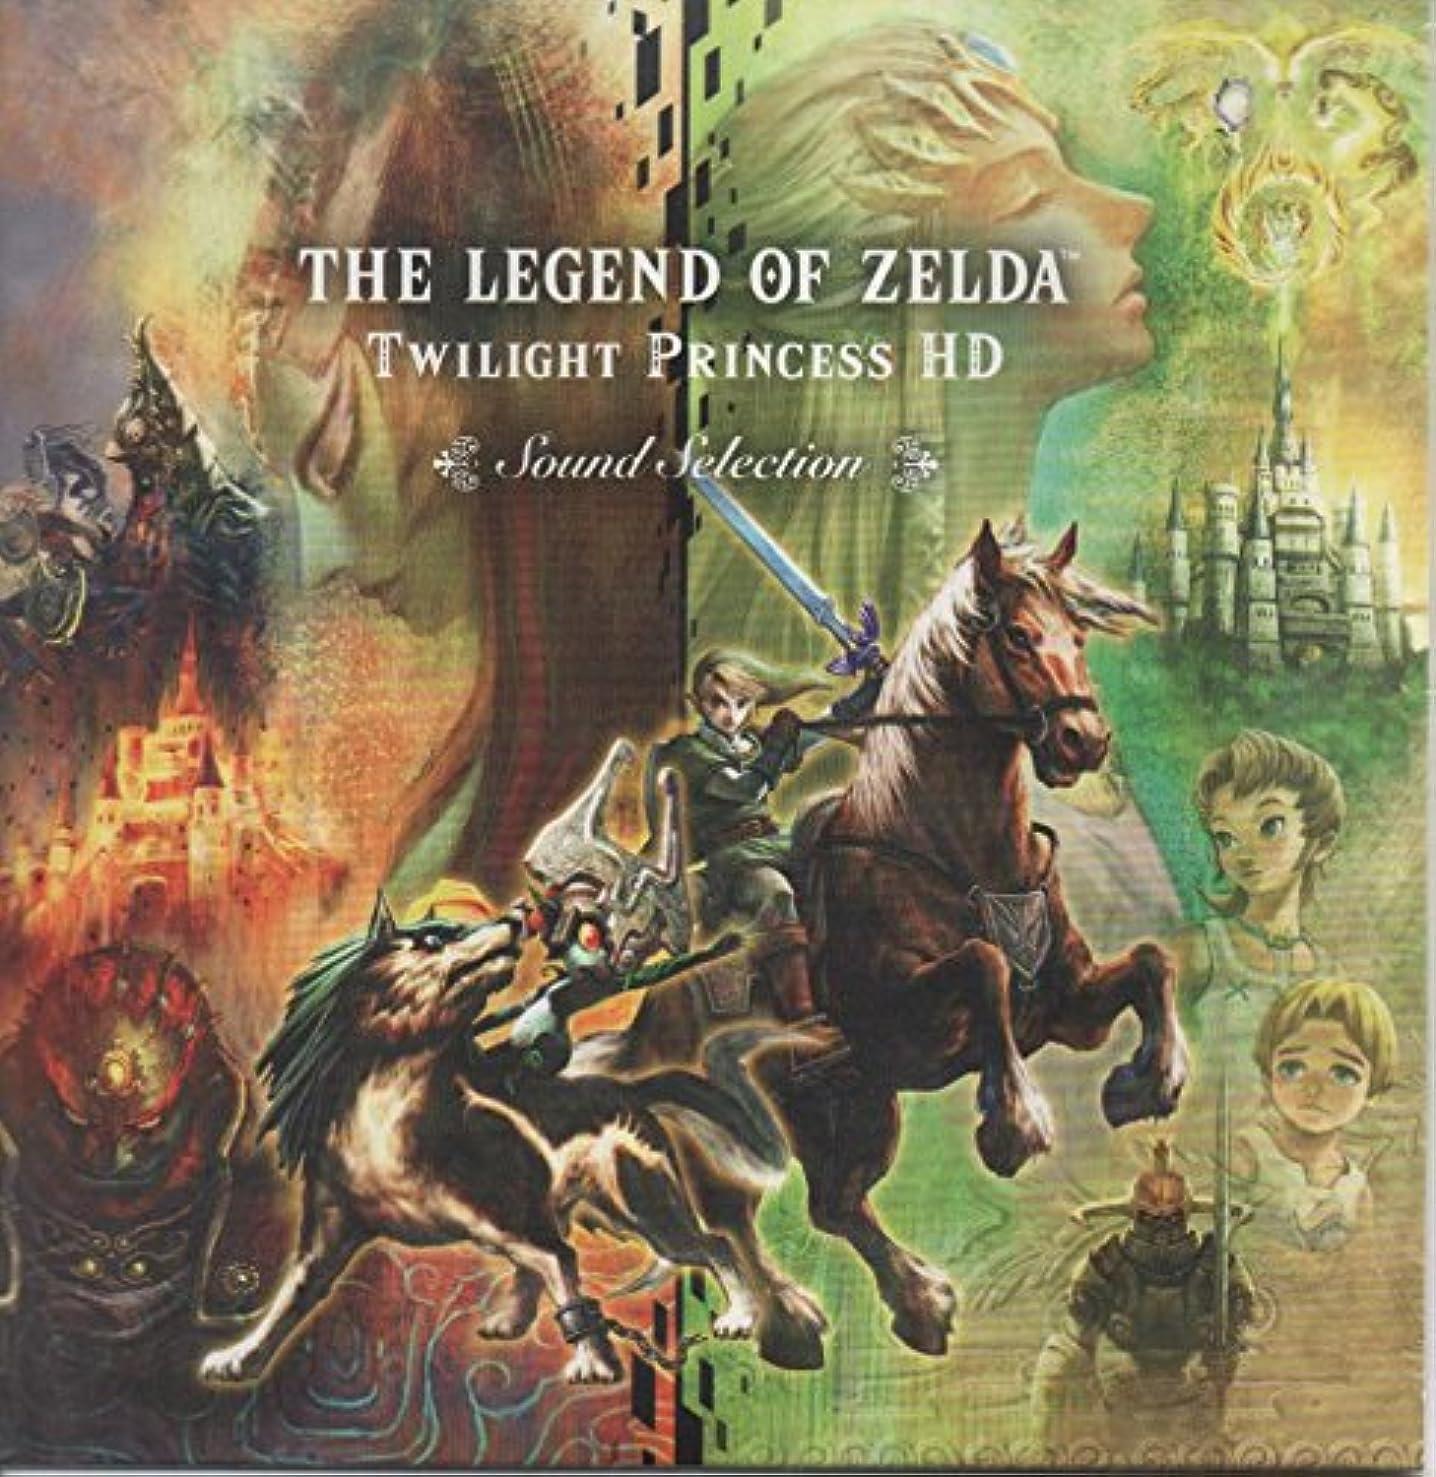 The Legend of Zelda Twilight Princess HD Sound Selection Soundtrack Music CD